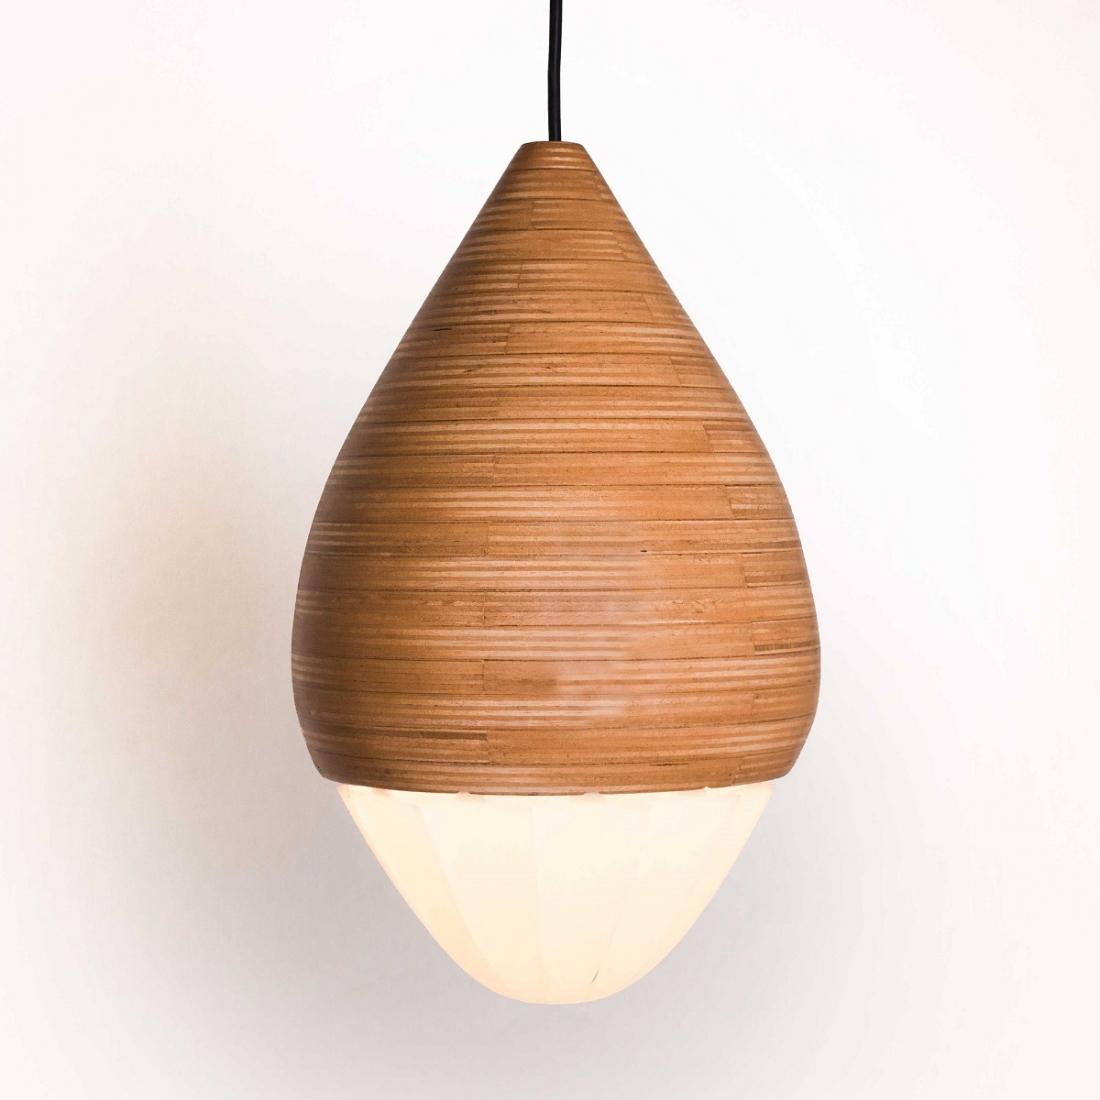 Hive Plywood Multifunctional Lamp Globe